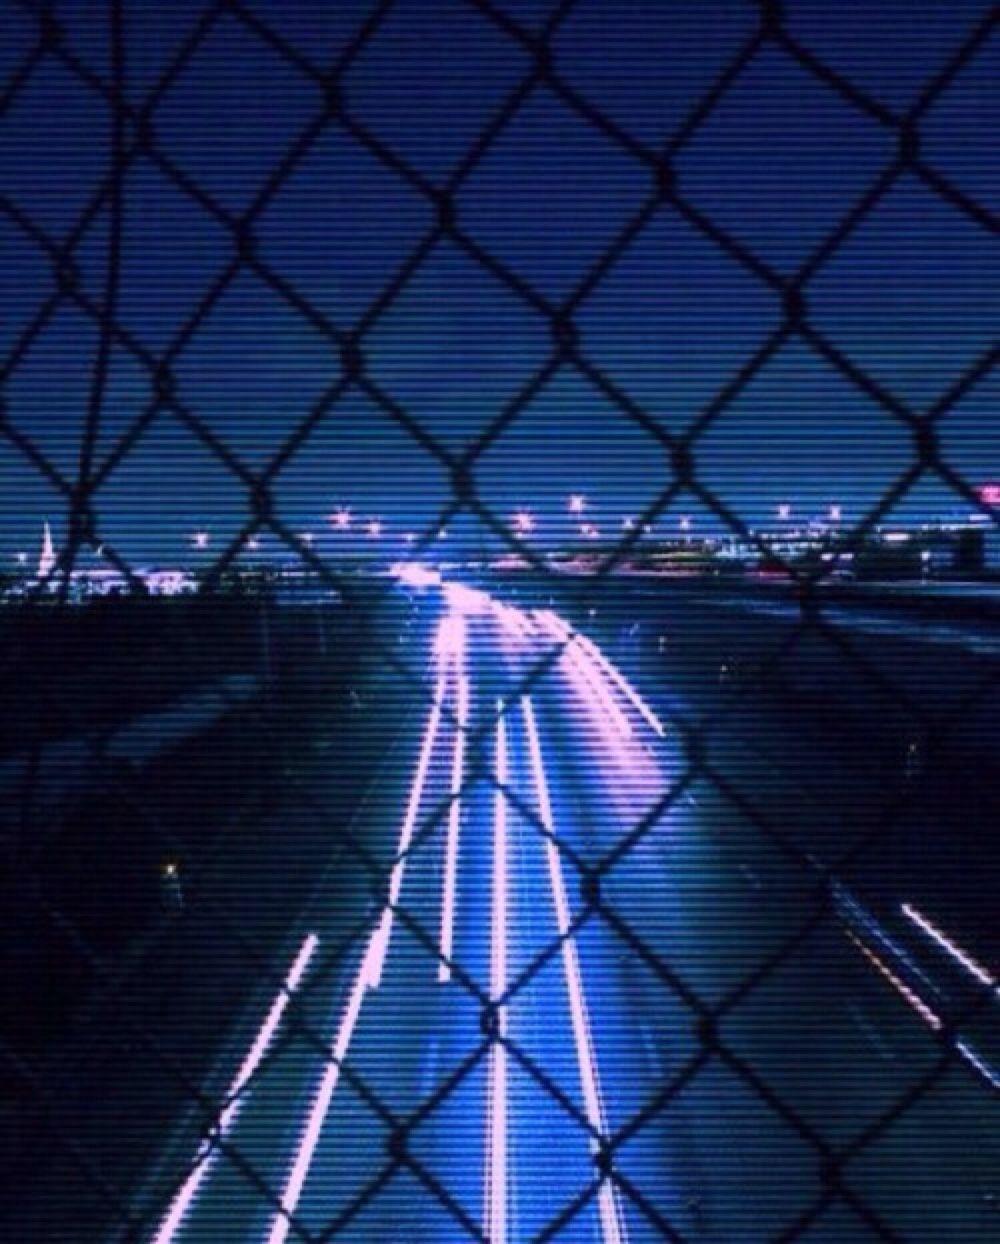 neon blue blur drive aesthetic road lit fence lights city